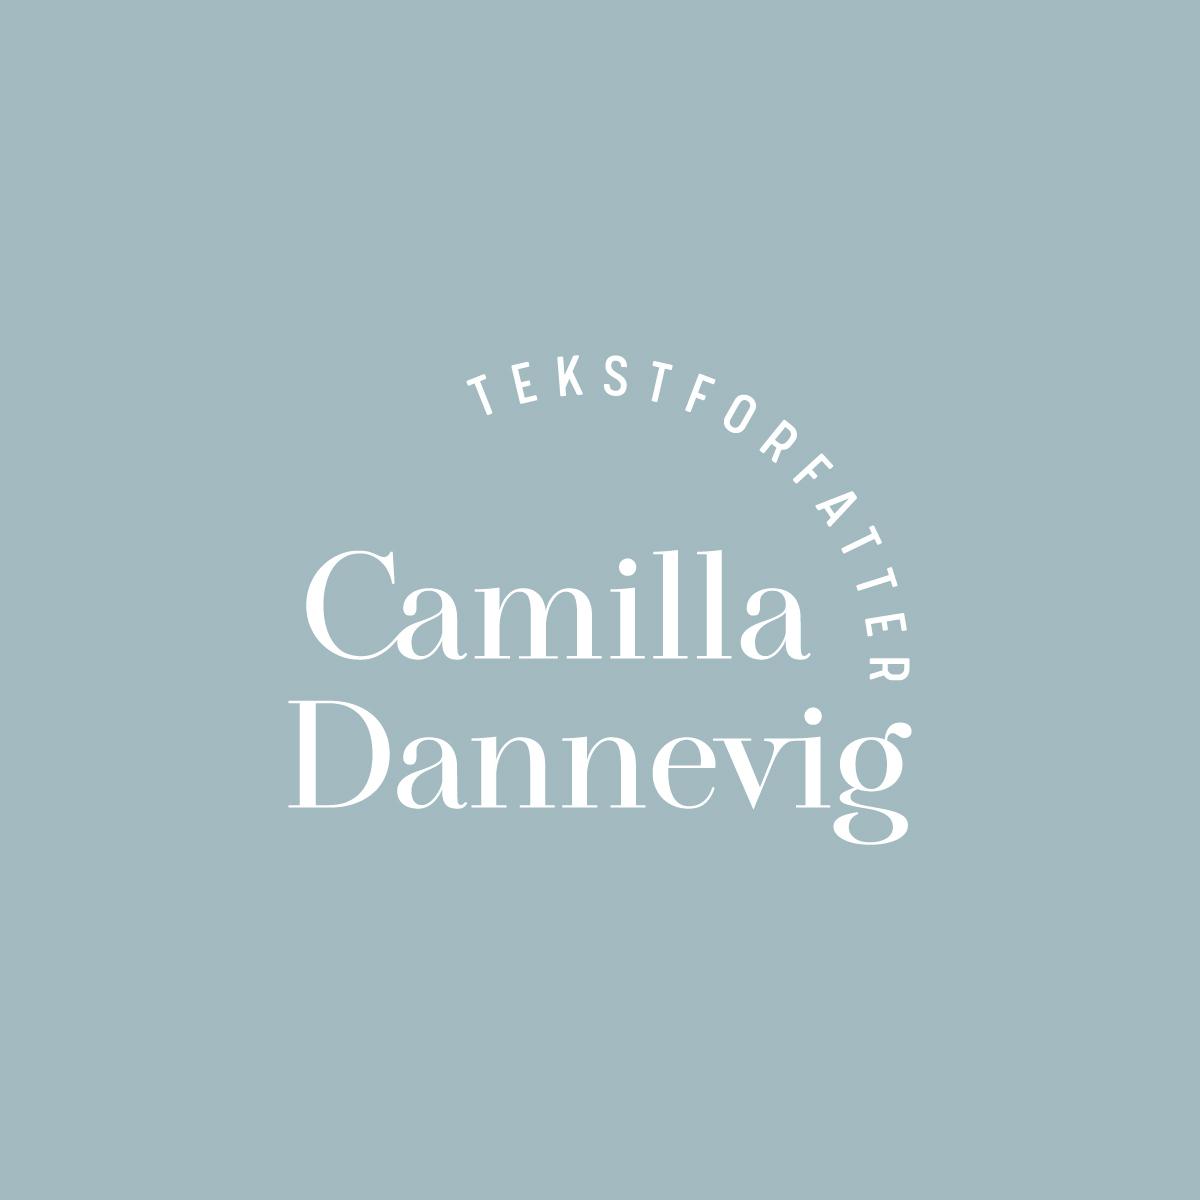 Camilla Dannevig Logo